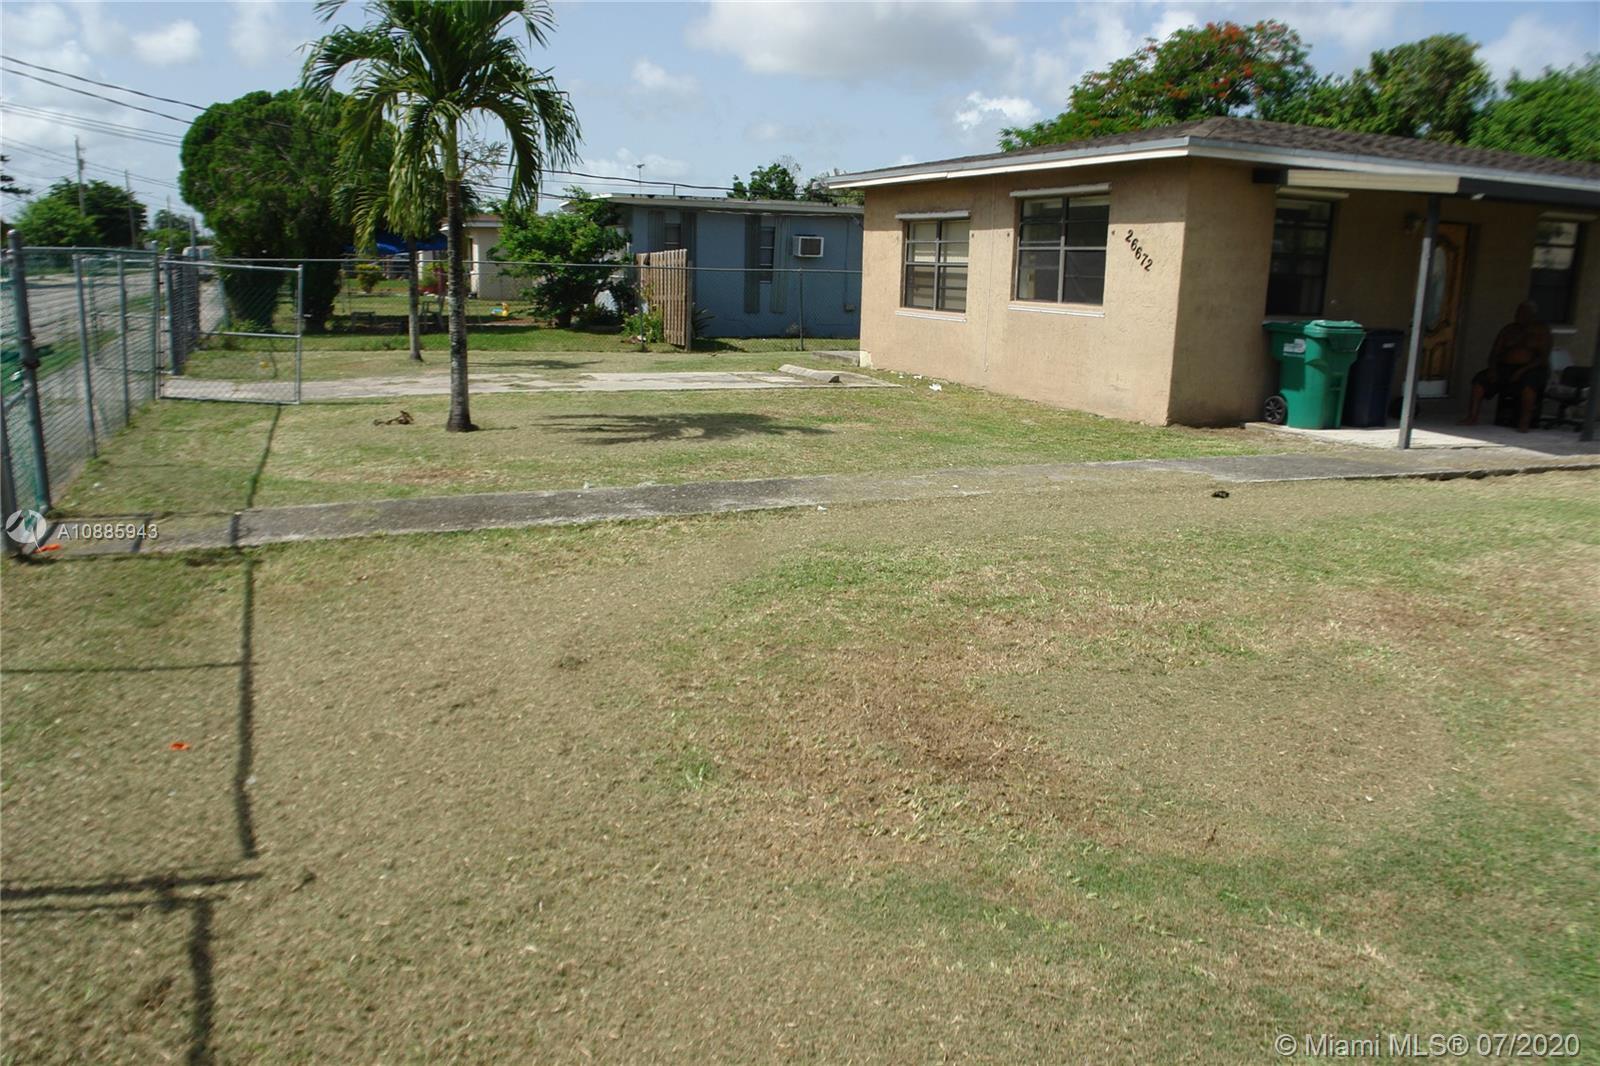 26672 SW 137th Ct Property Photo